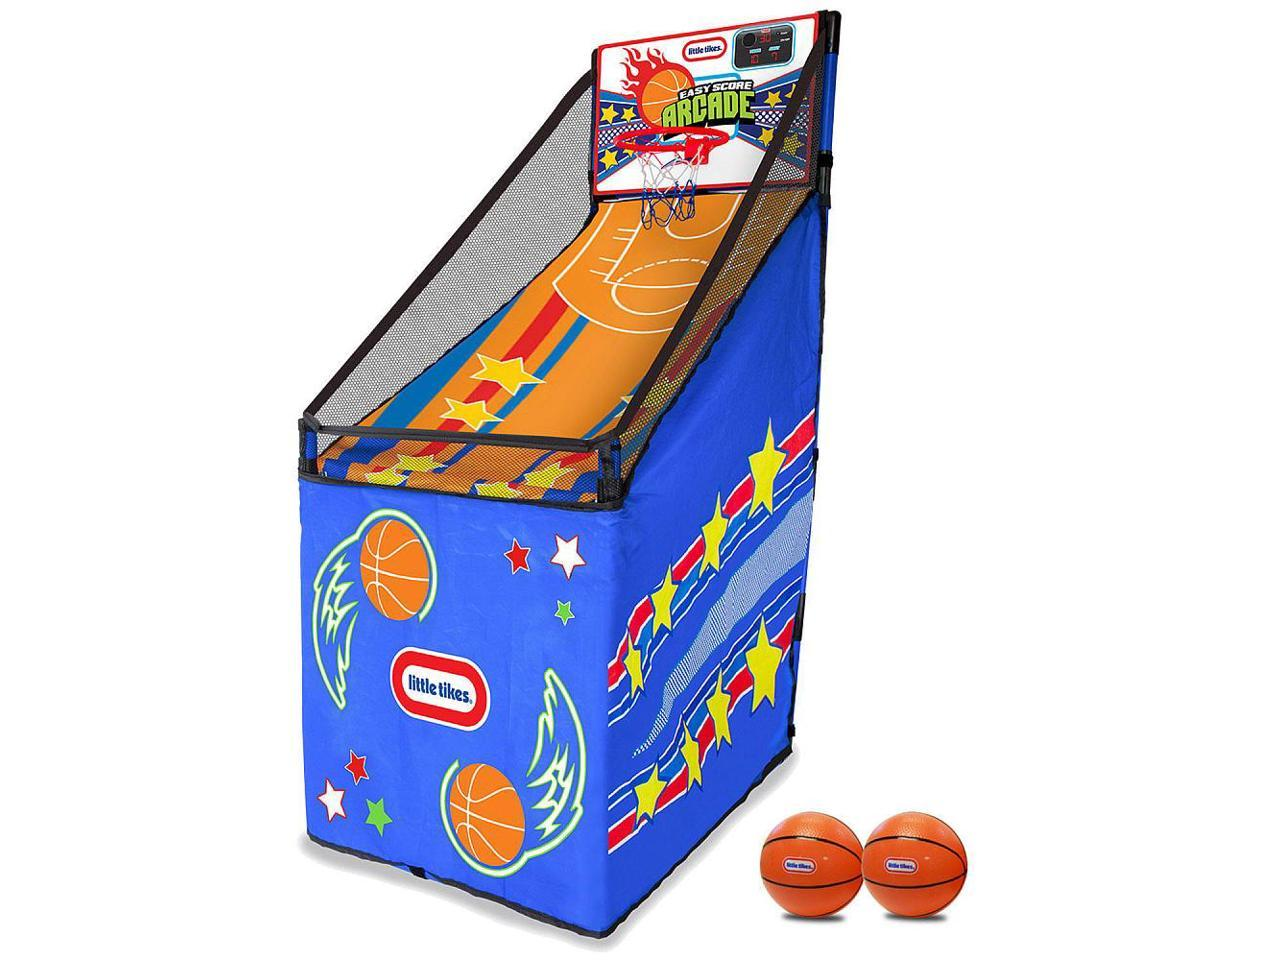 Little Tikes Easy Score Basketball Arcade